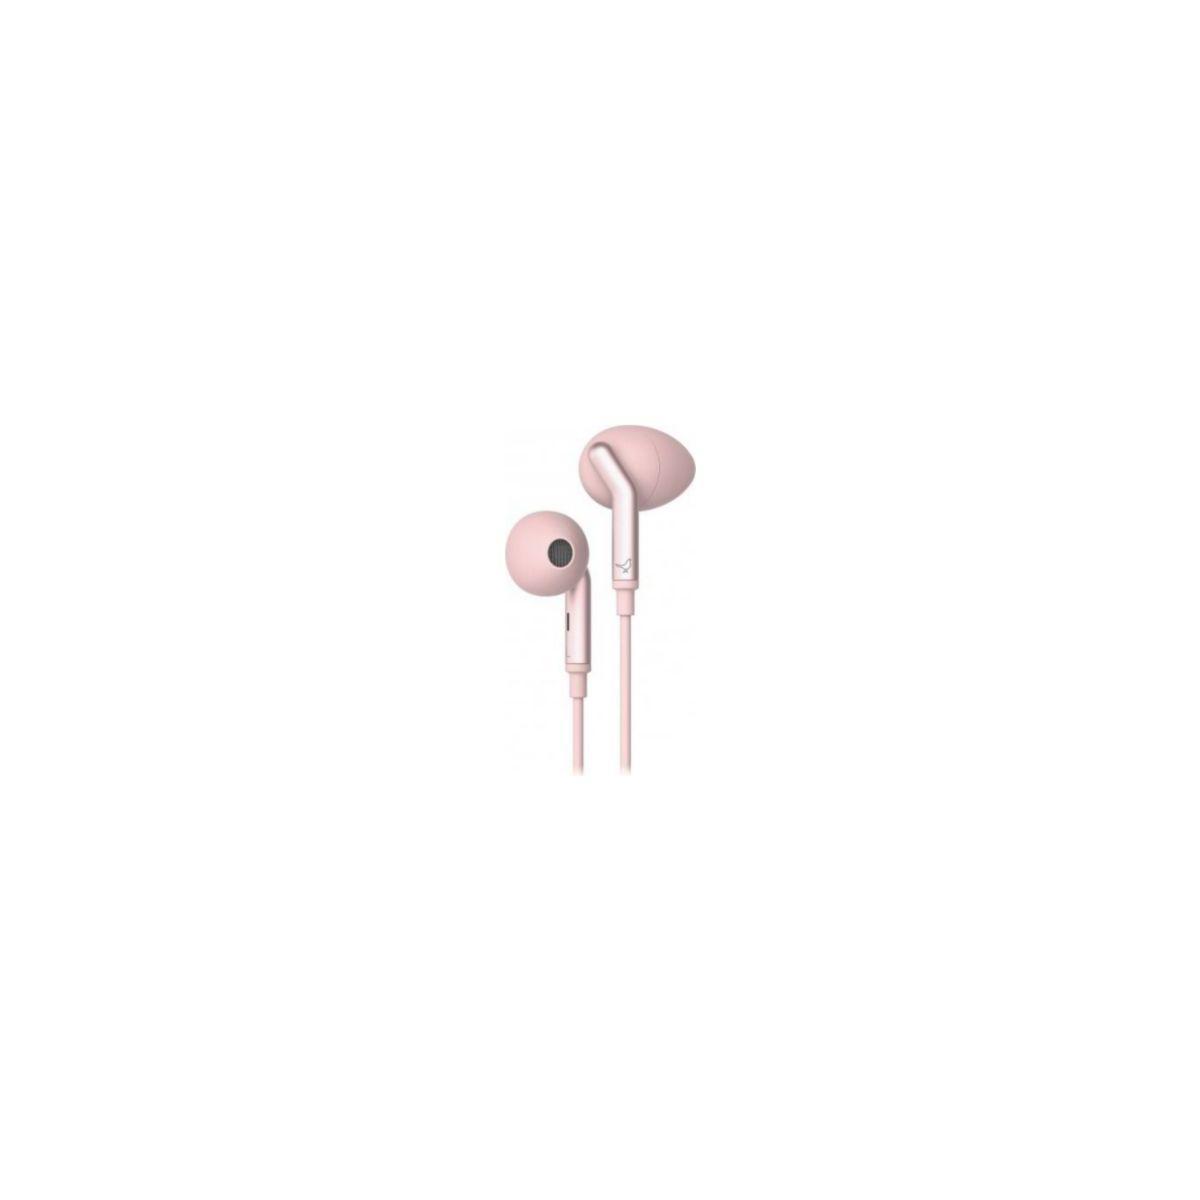 Ecouteurs libratone q adapt in-ear rose - livraison offerte : ...